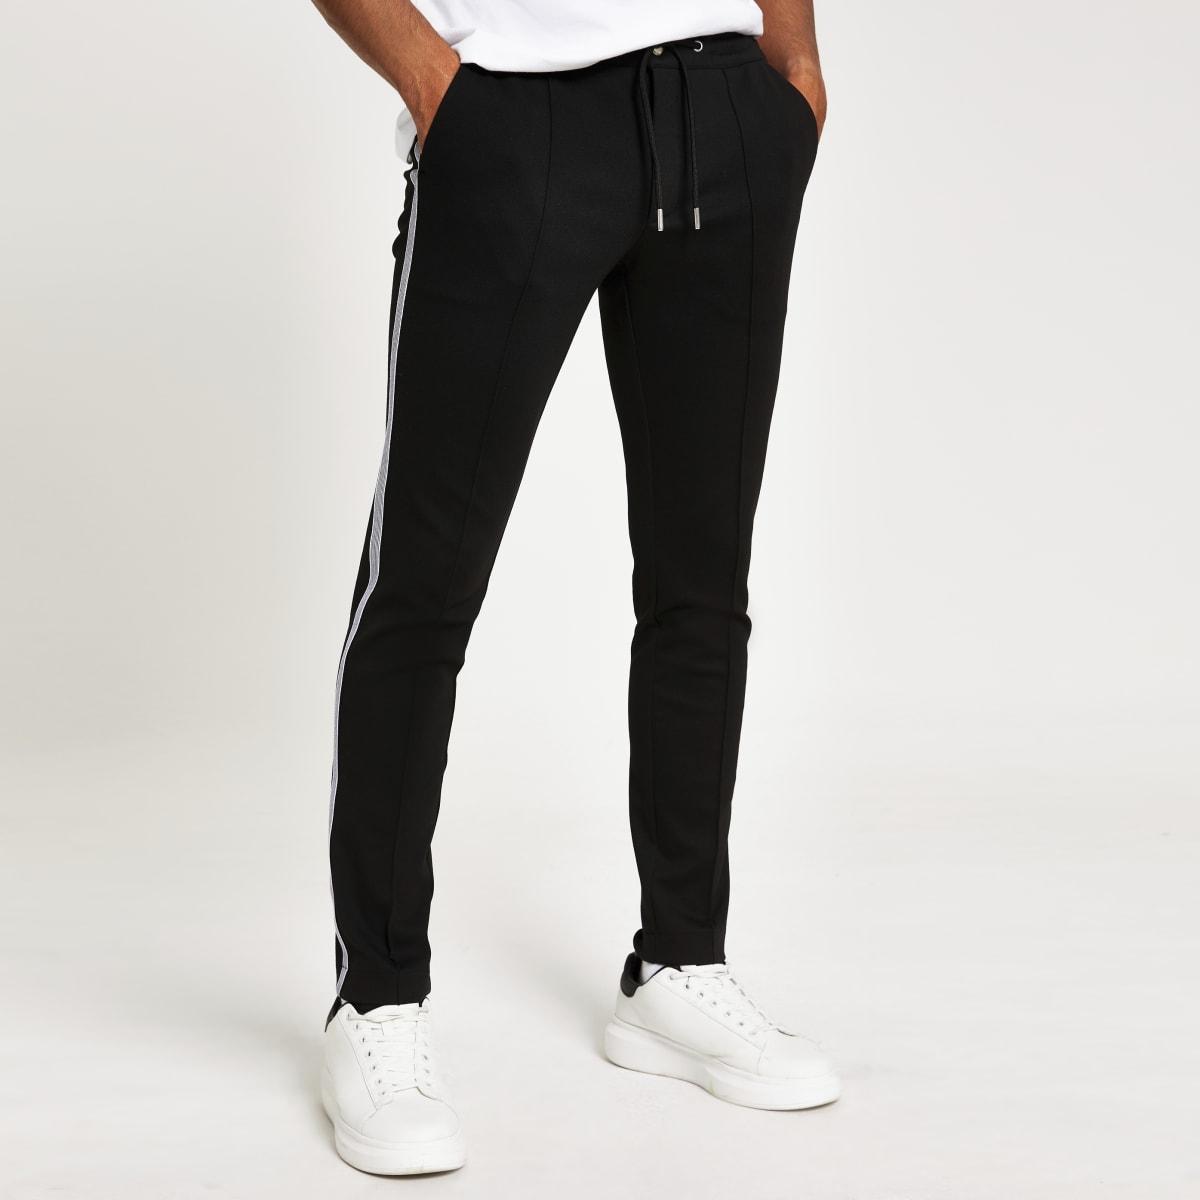 Zwarte superskinnynette joggingbroek